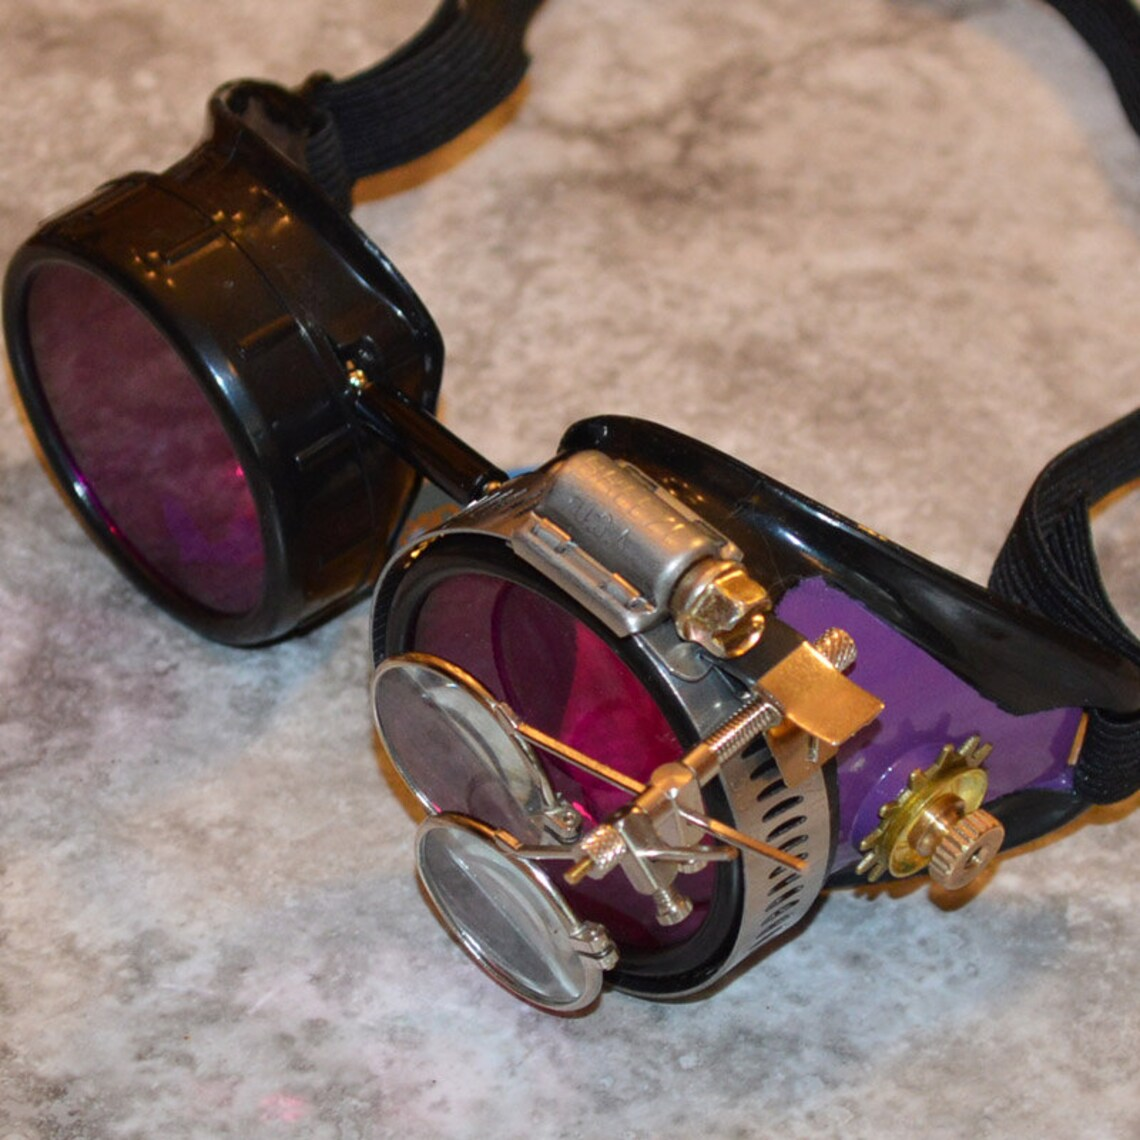 Gothic, Steampunk Goggles, Steam Punk, Aviator Goggles, Welding Goggles, Steam Punk Goggles, Fallout, Sunglasses, Victorian, Purple